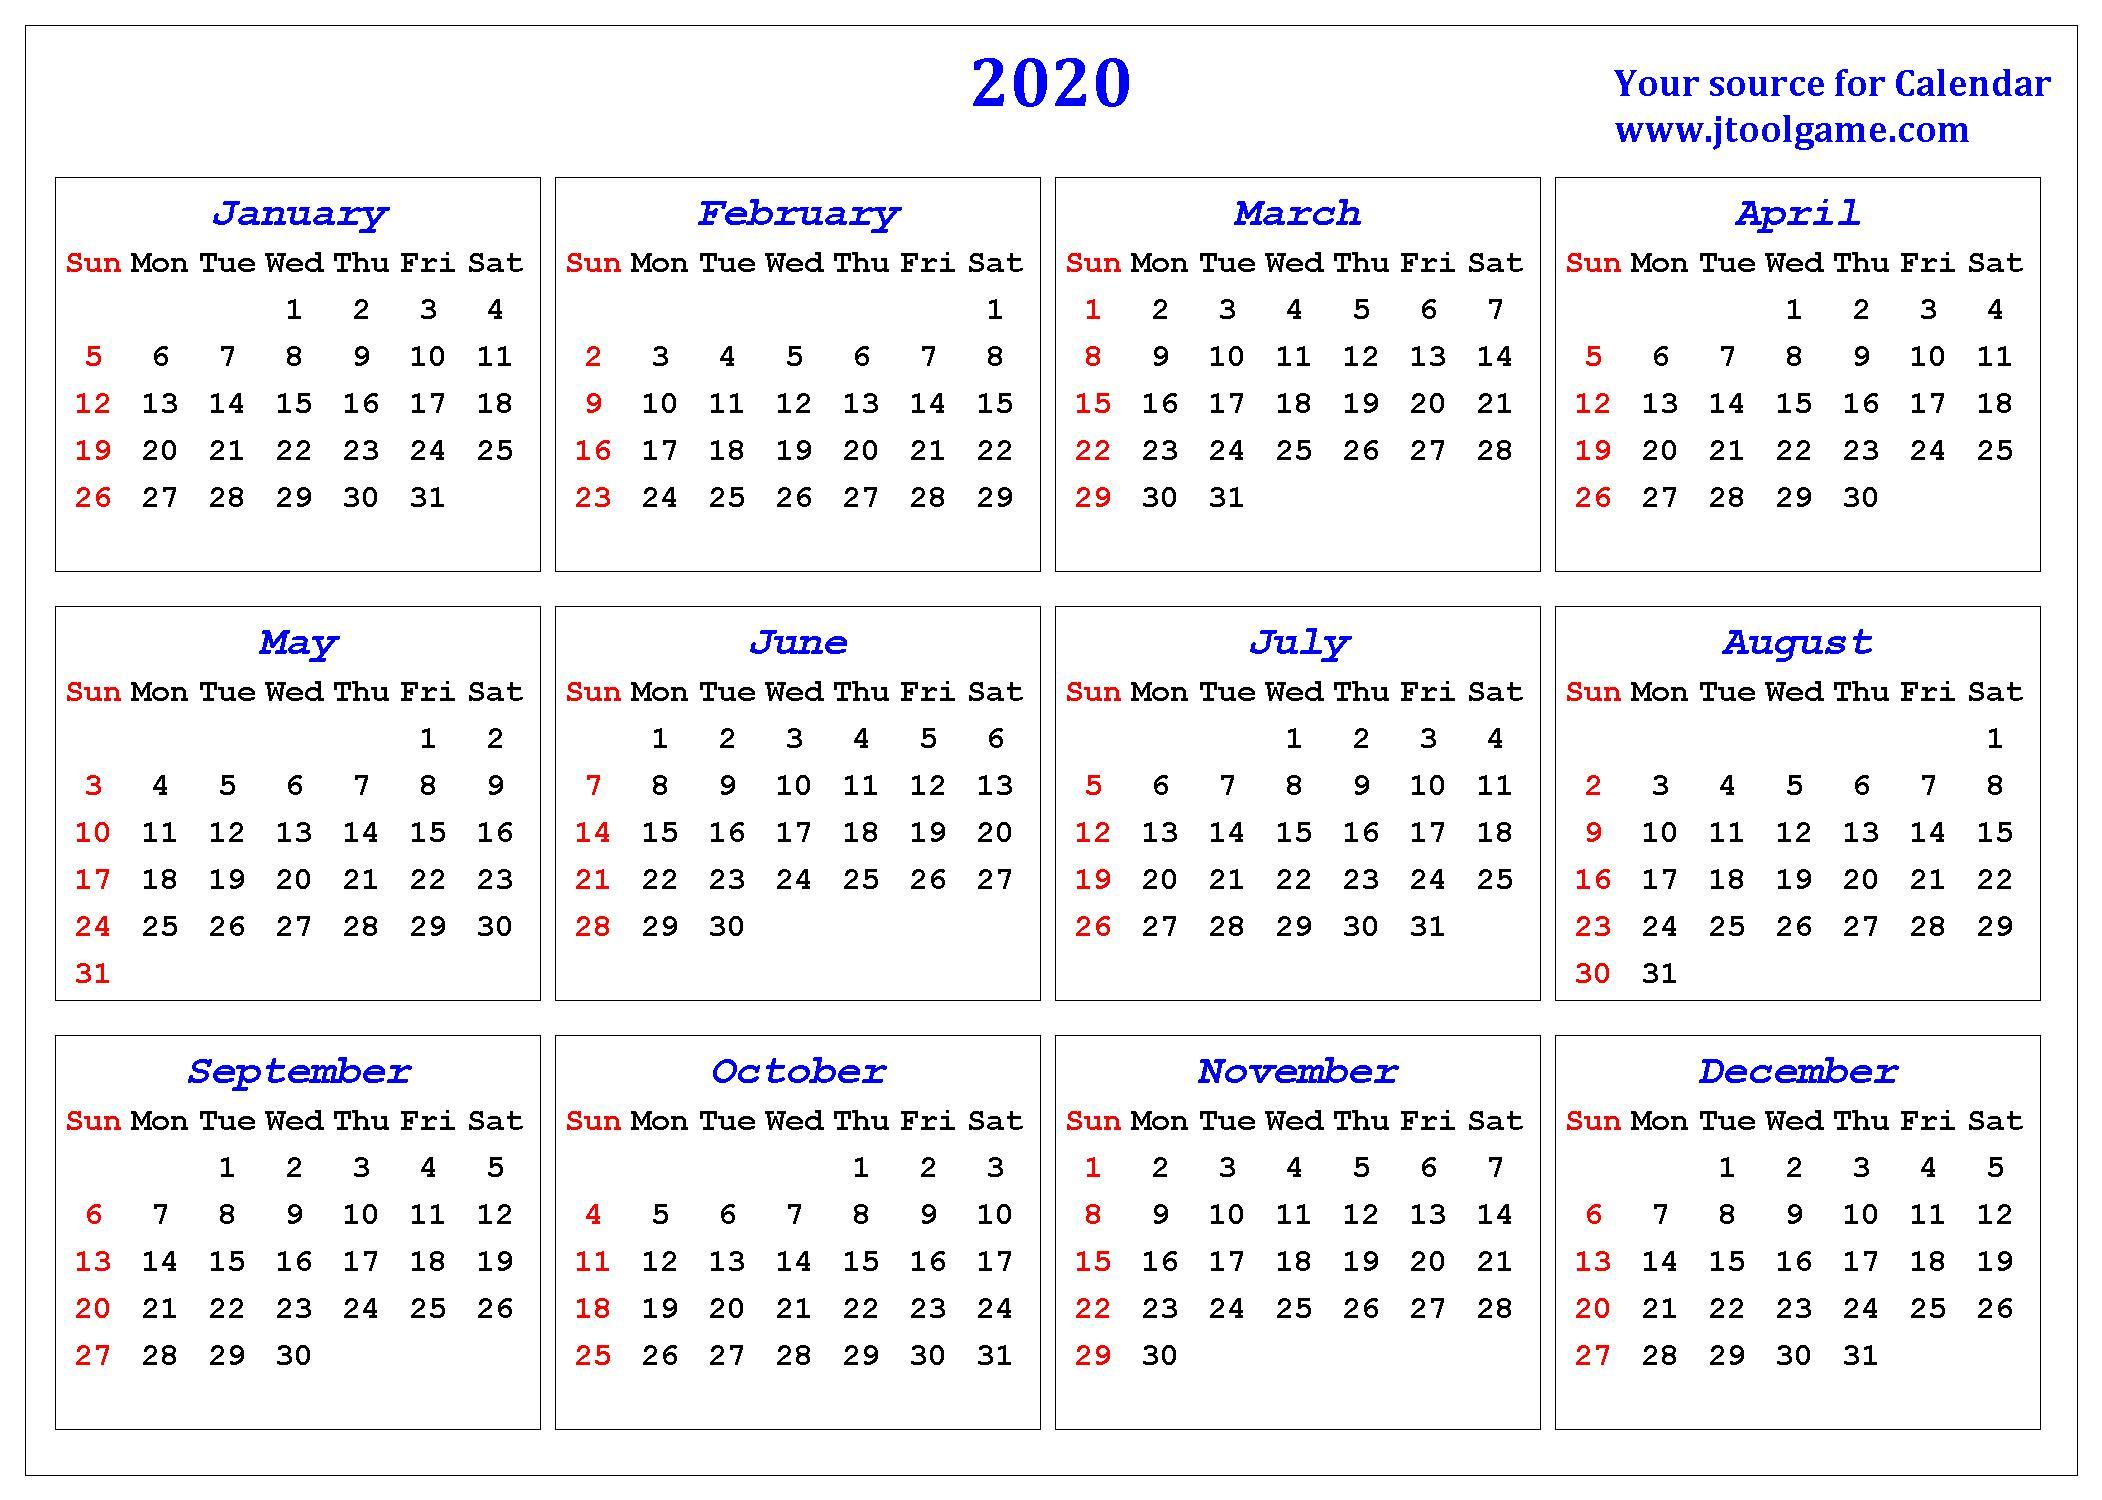 2020 Calendar  Printable Calendar. 2020 Calendar In inside Calendar Martie 2020